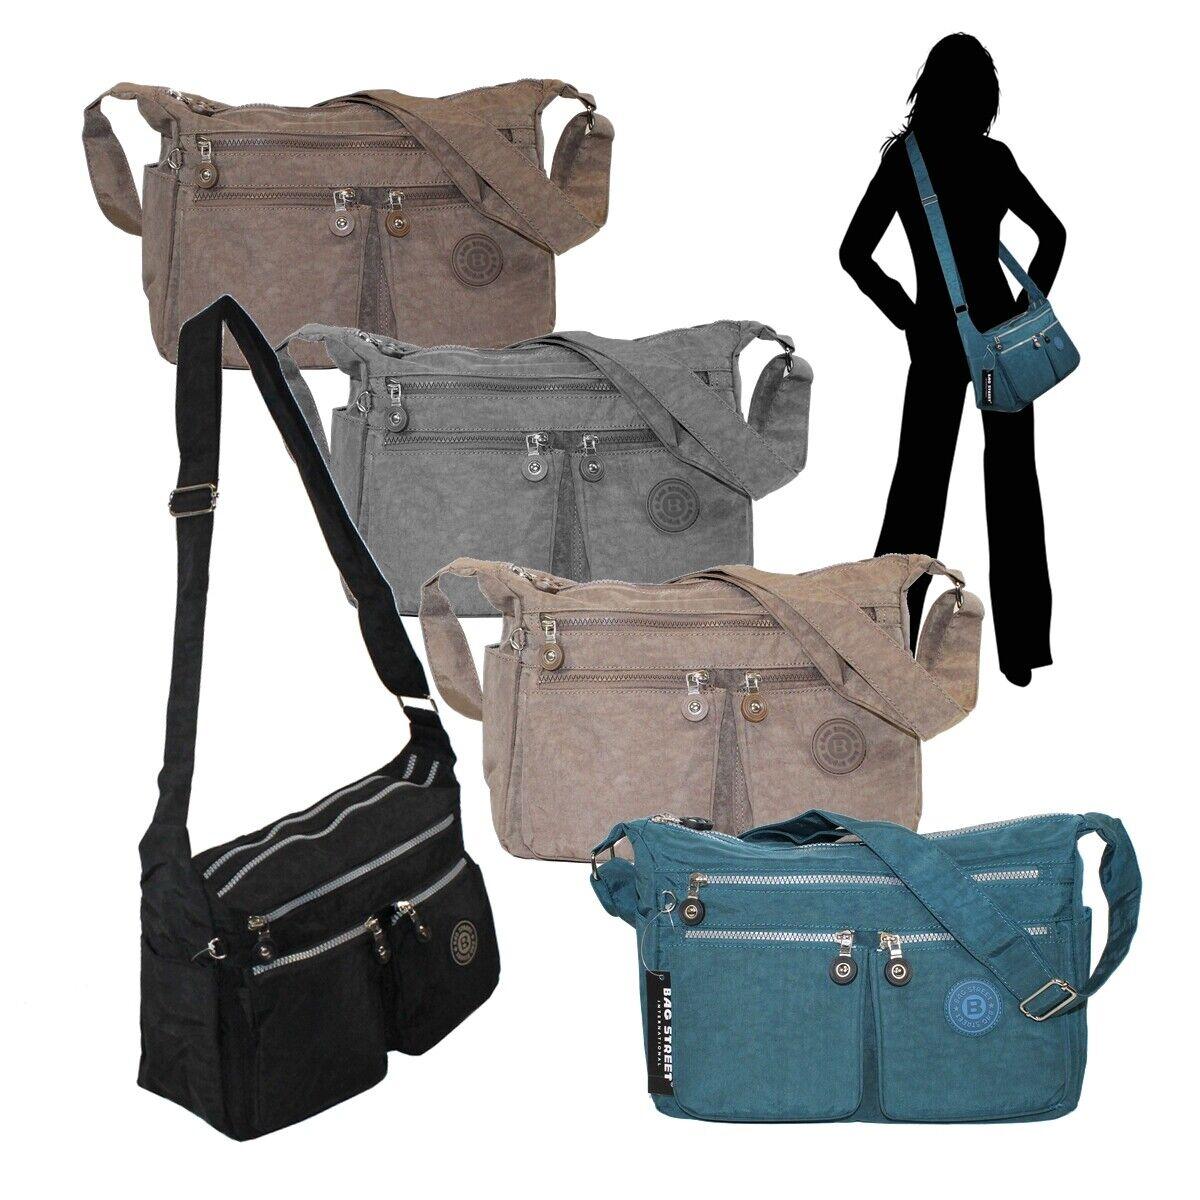 8de1a2702e4bc Bag Street Nylon Umhängetasche Damen Handtasche viele Fächer leicht  Farbwahl ...